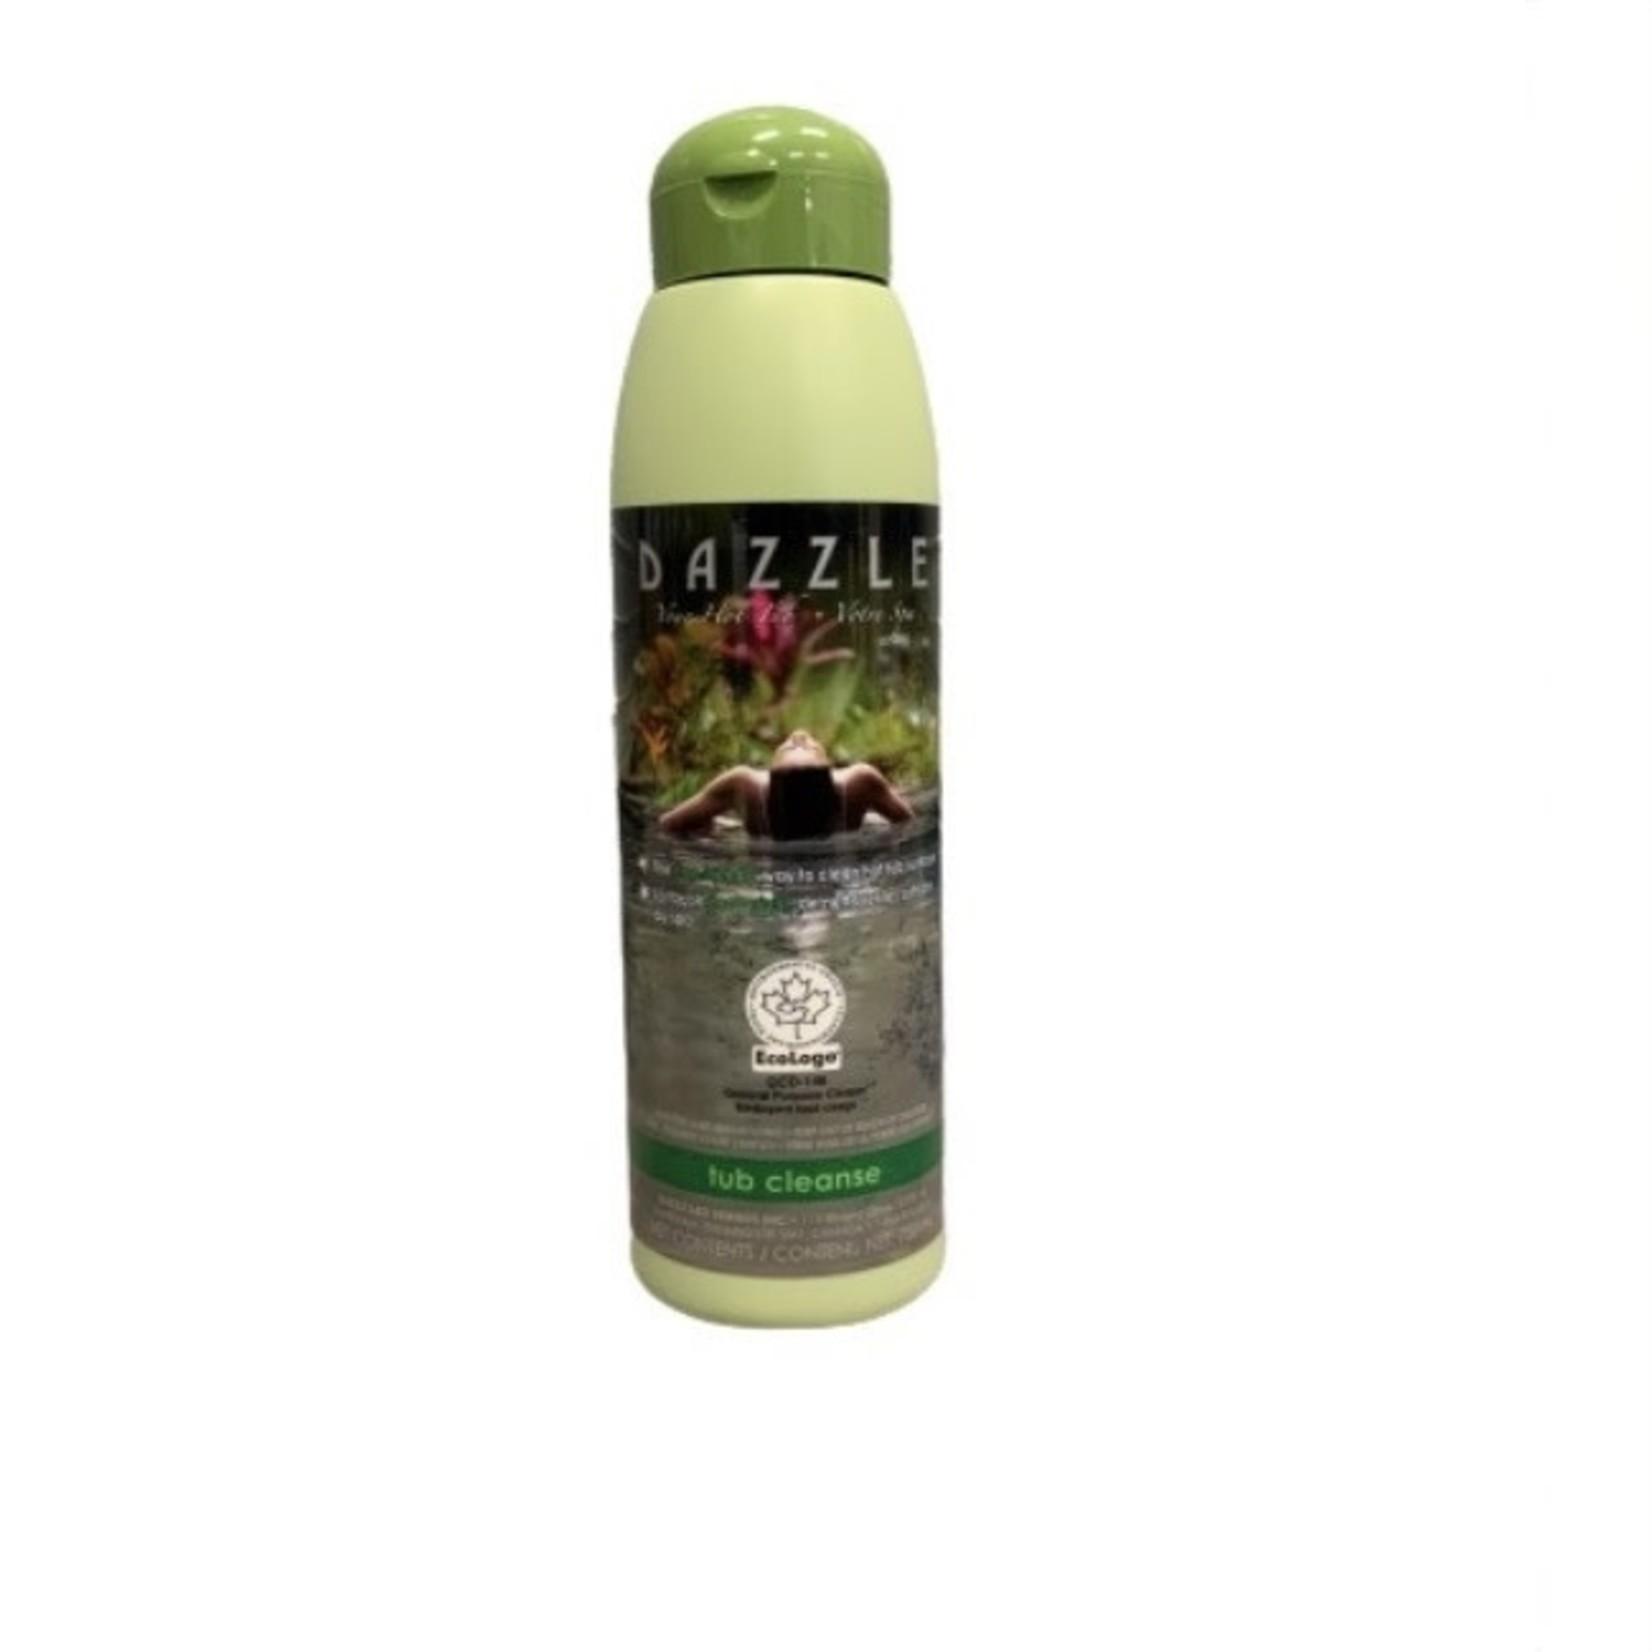 Dazzle DAZZLE TUB CLEANSE SPA 750 ML